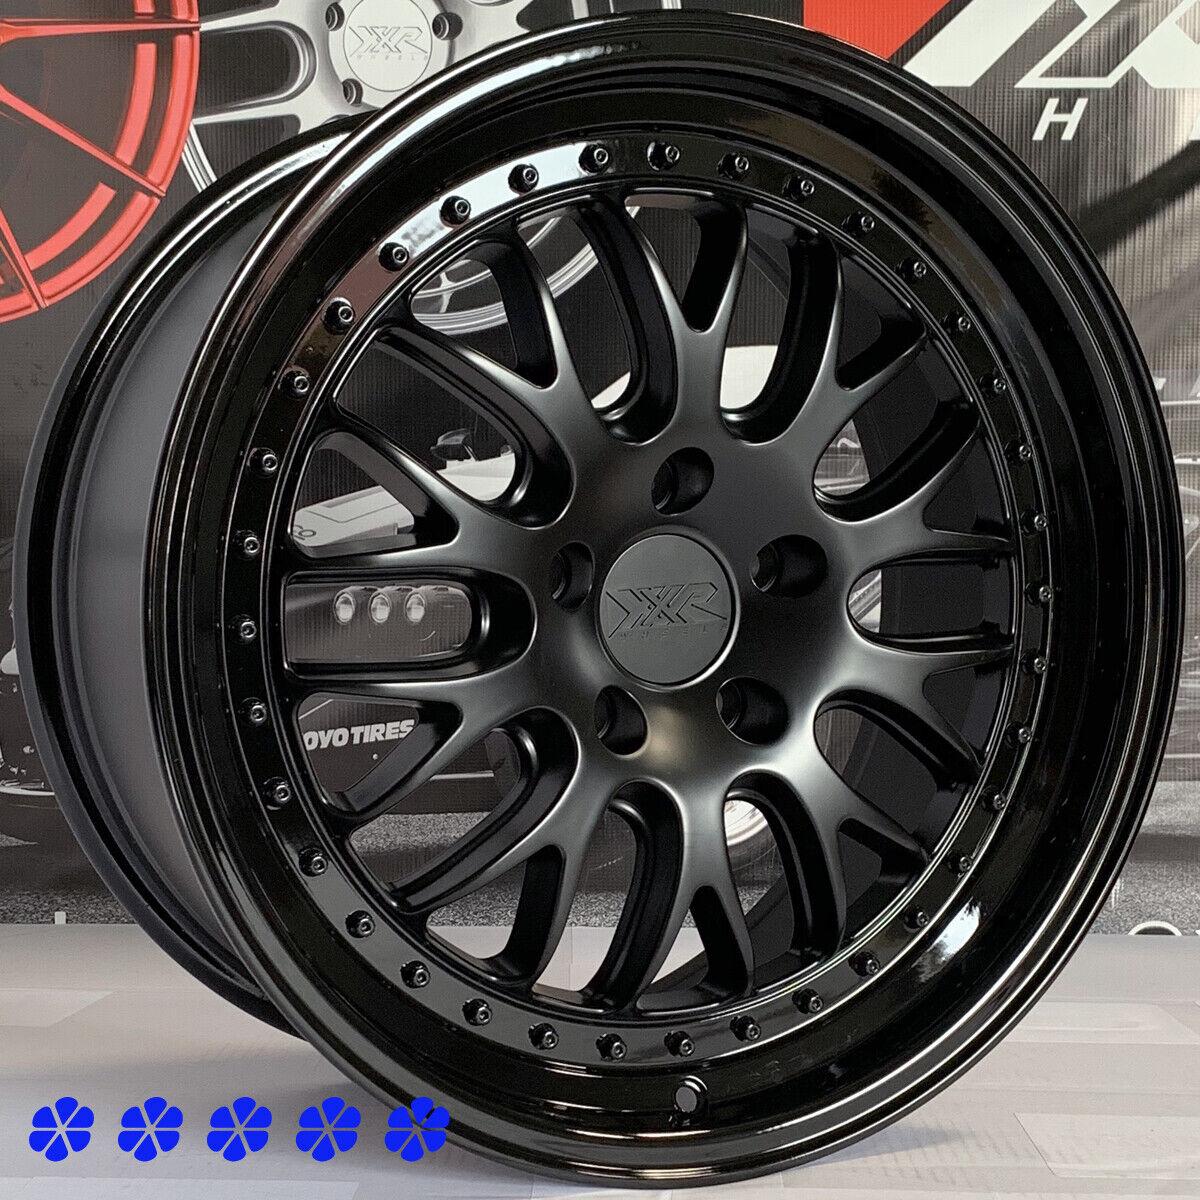 2015 Mustang Xxr 570 Wheels >> Details About Xxr 570 Wheels 18 X 8 5 35 Flat Black Gloss Lip Rims 5x114 3 Acura Rsx Type S